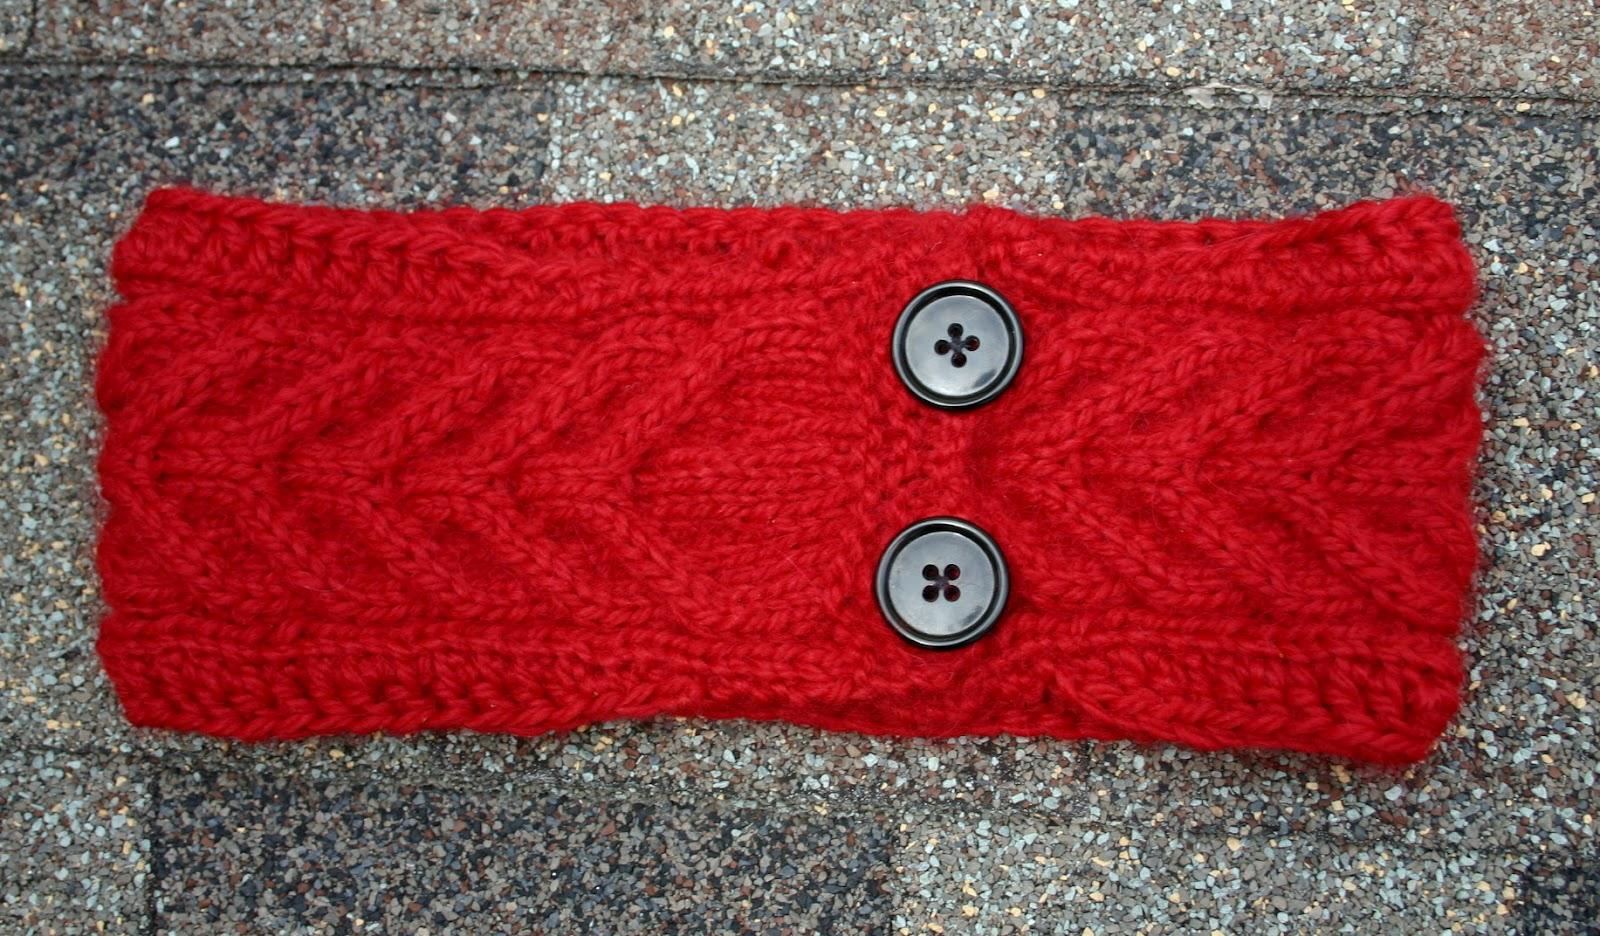 10 Knit Headband Patterns with Button - The Funky Stitch